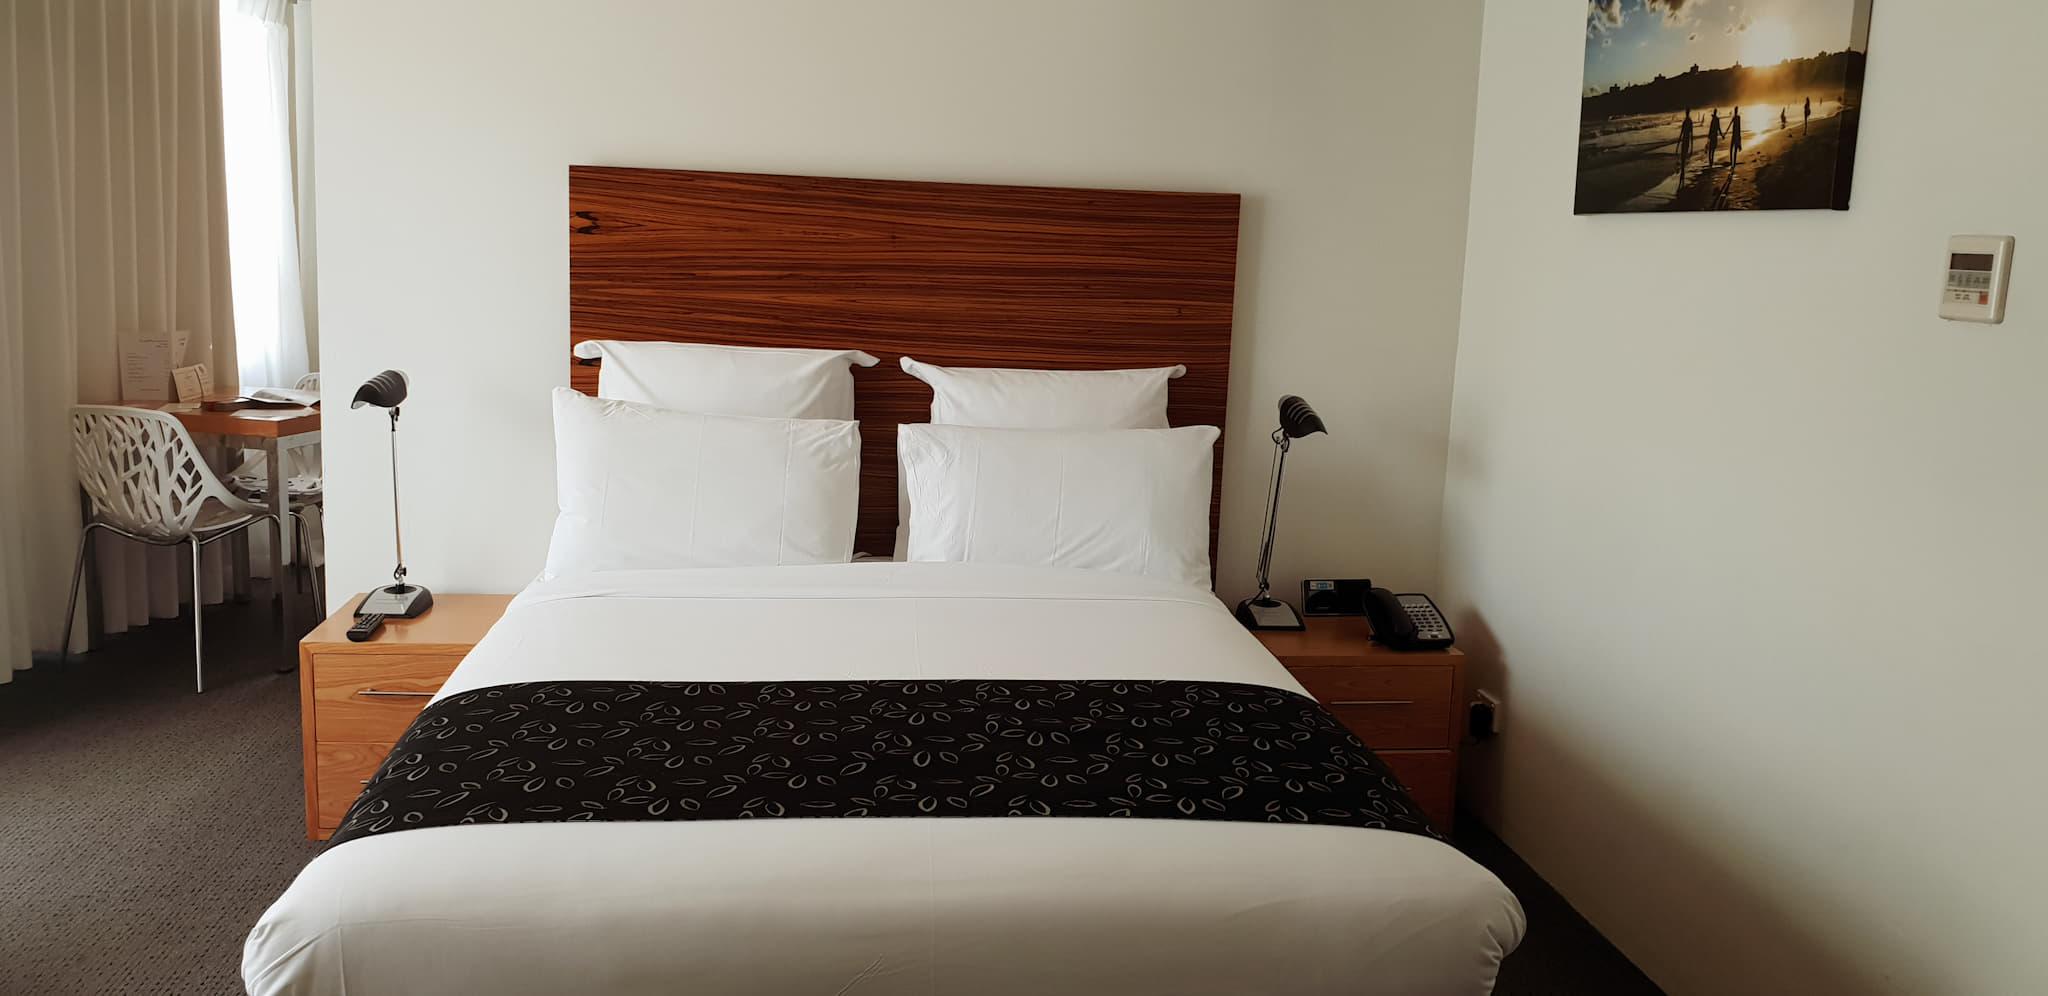 The Cambridge Hotel bed